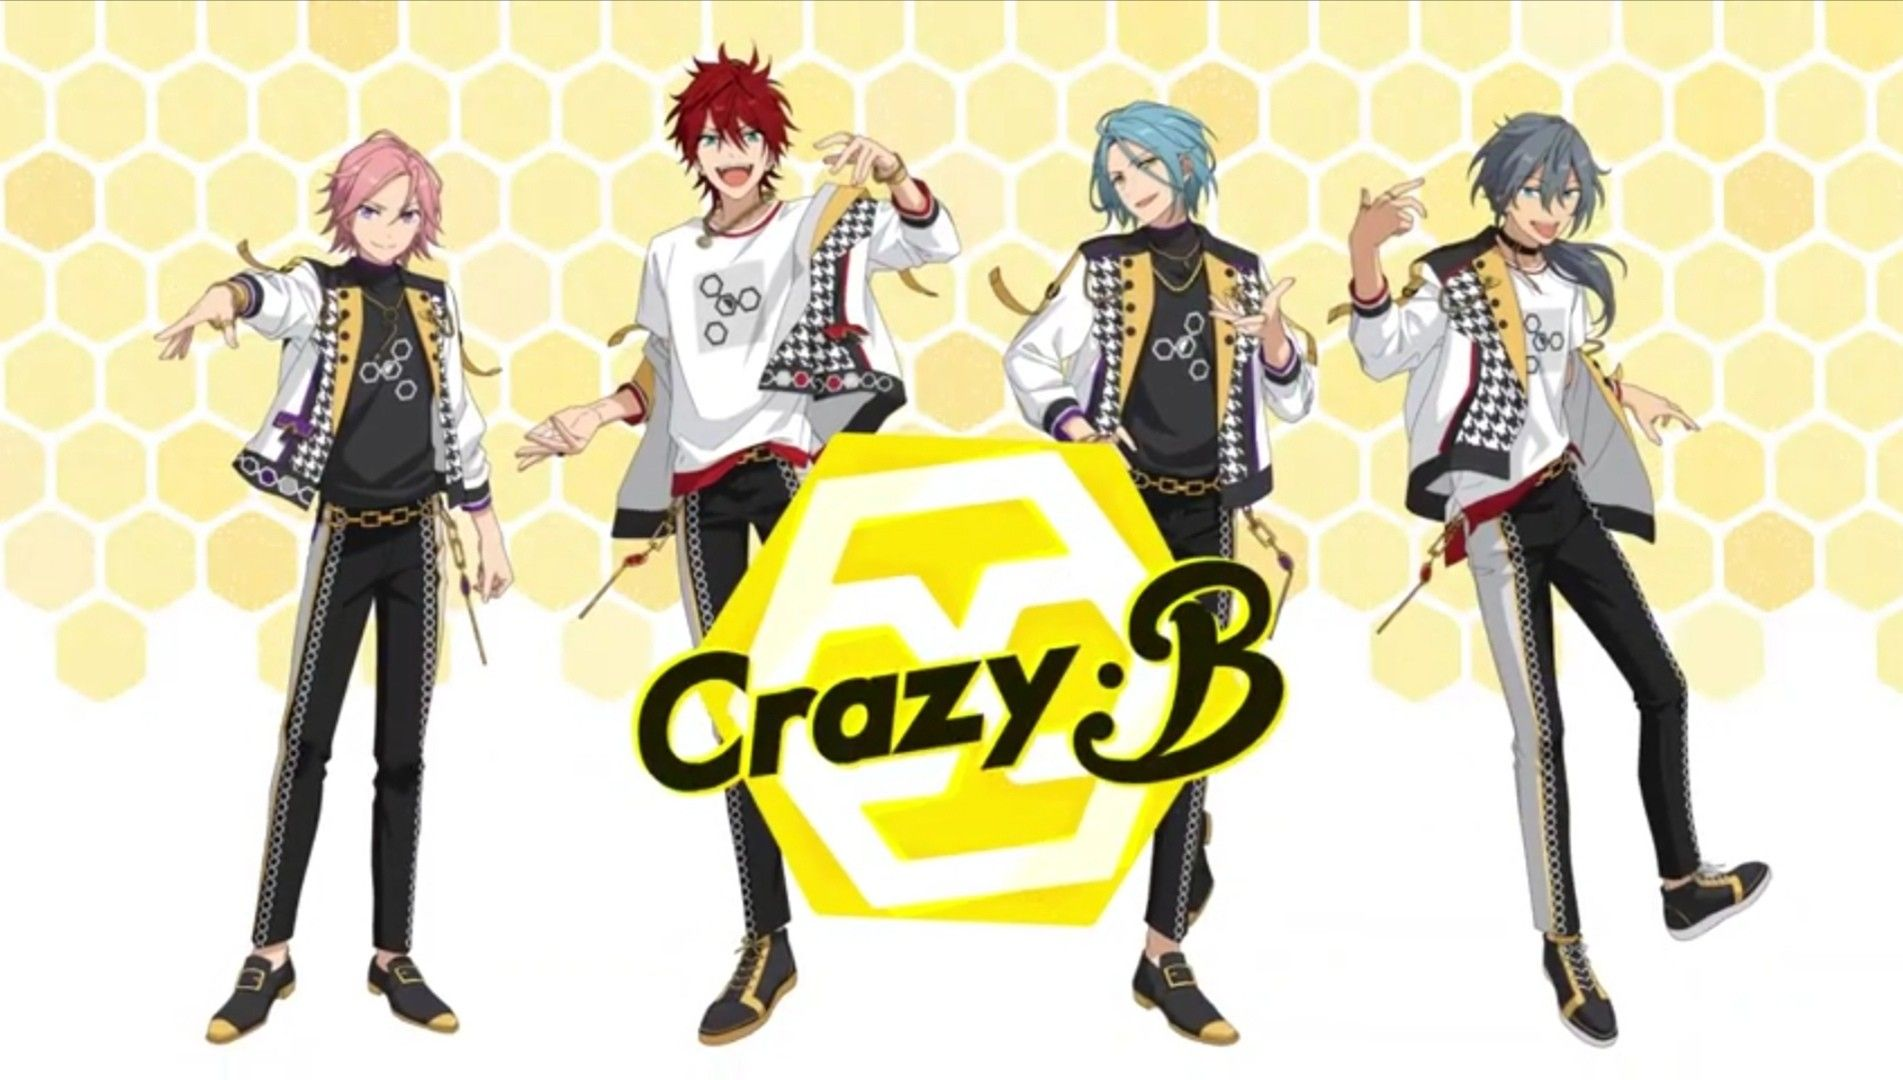 Japan Top Weekly Anime Bluray and DVD Ranking January 27